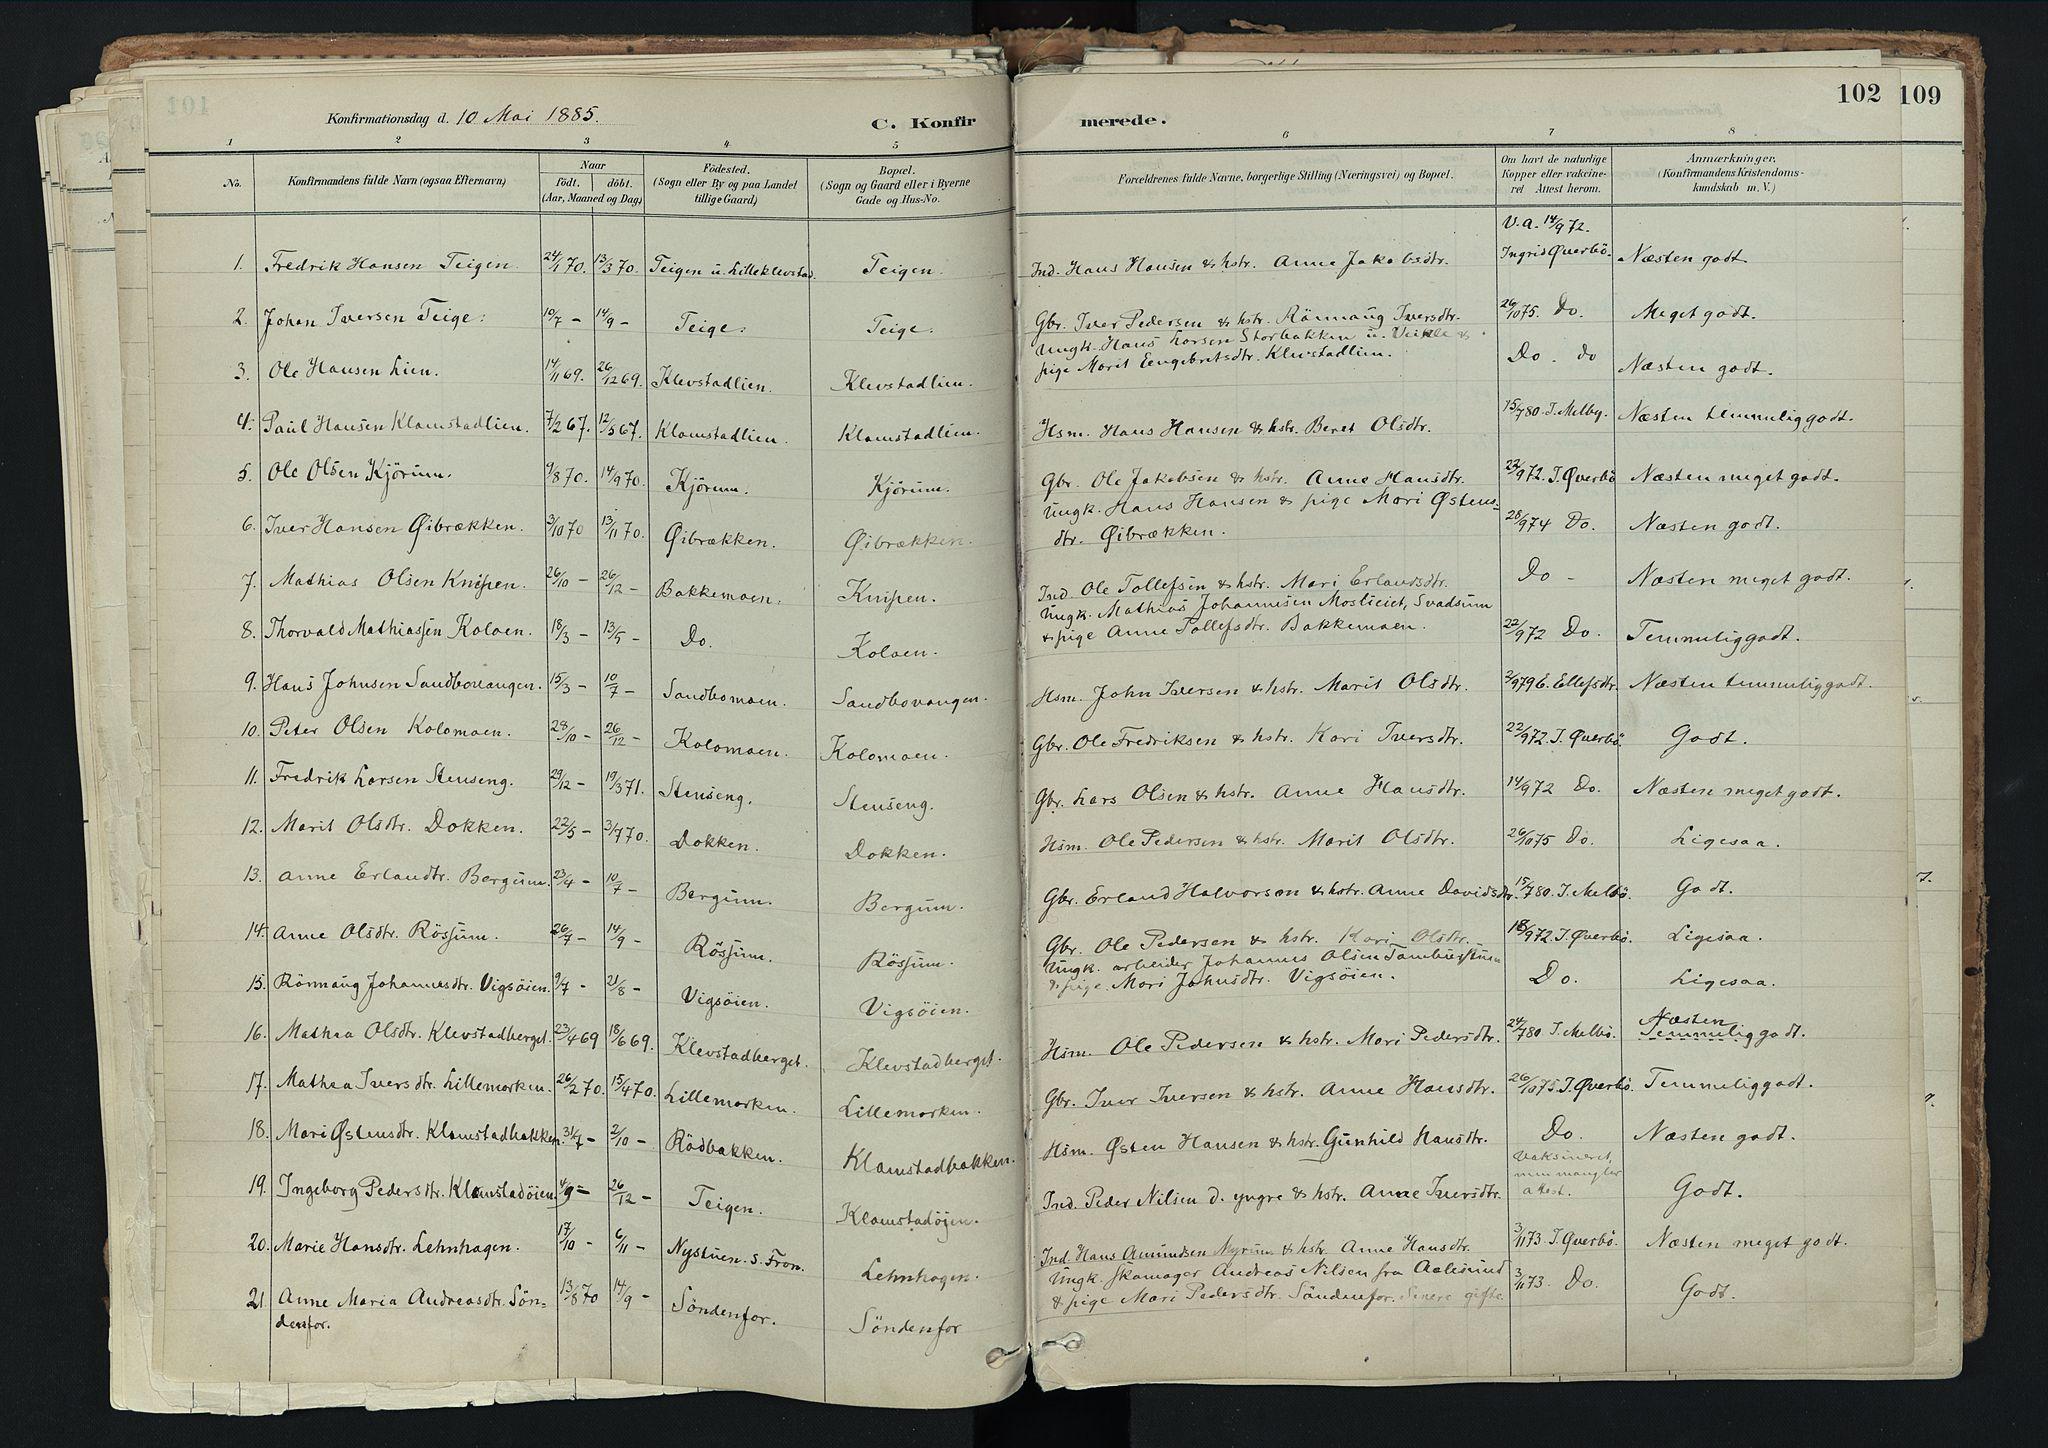 SAH, Nord-Fron prestekontor, Ministerialbok nr. 3, 1884-1914, s. 102